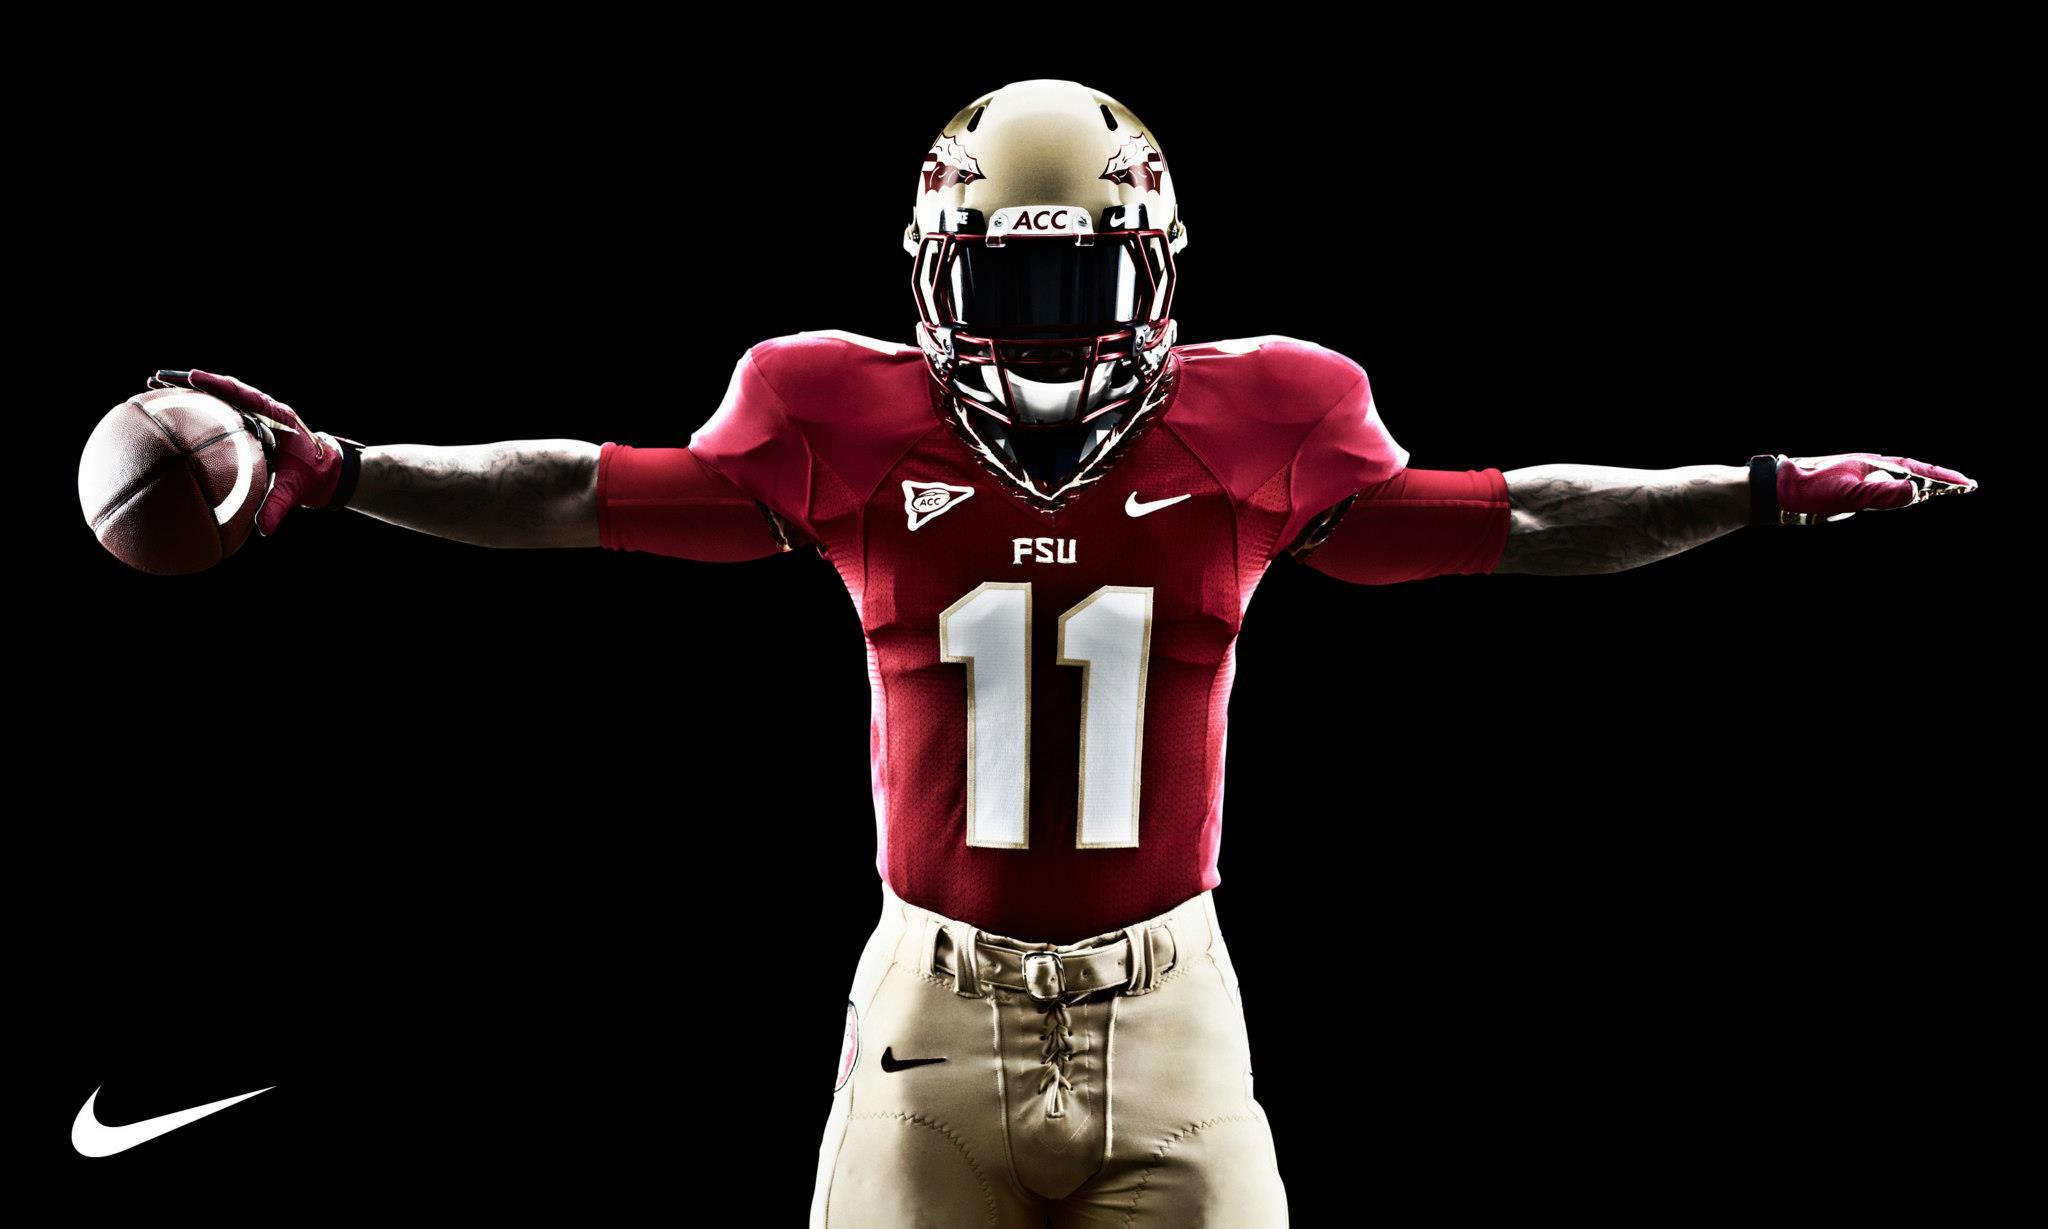 College Football Desktop Wallpapers HD.